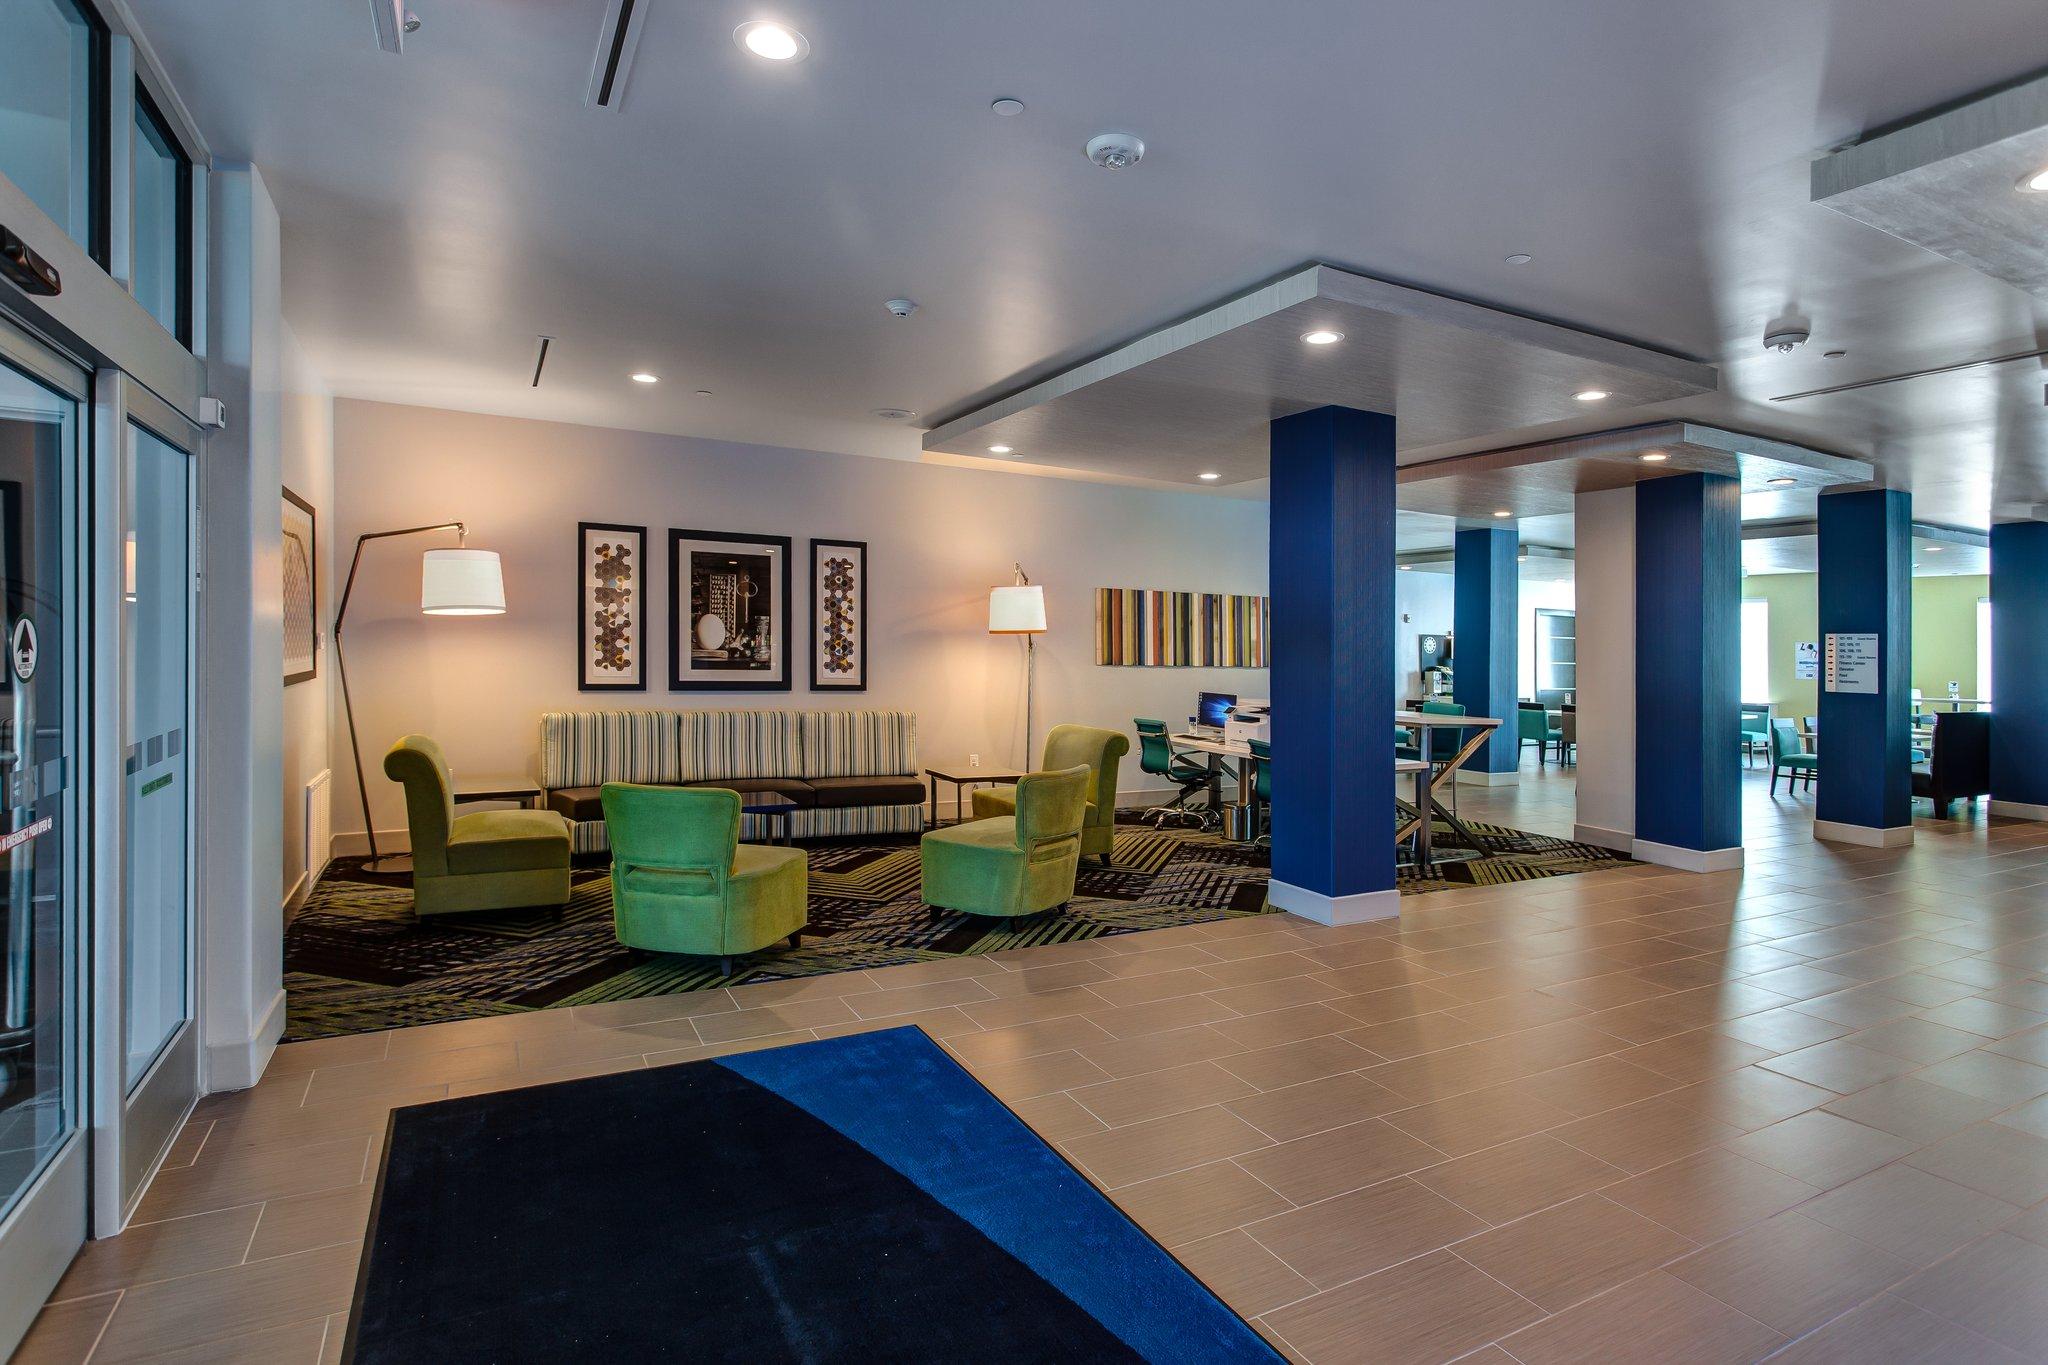 Holiday Inn Express & Suites GATESVILLE - N. FT HOOD